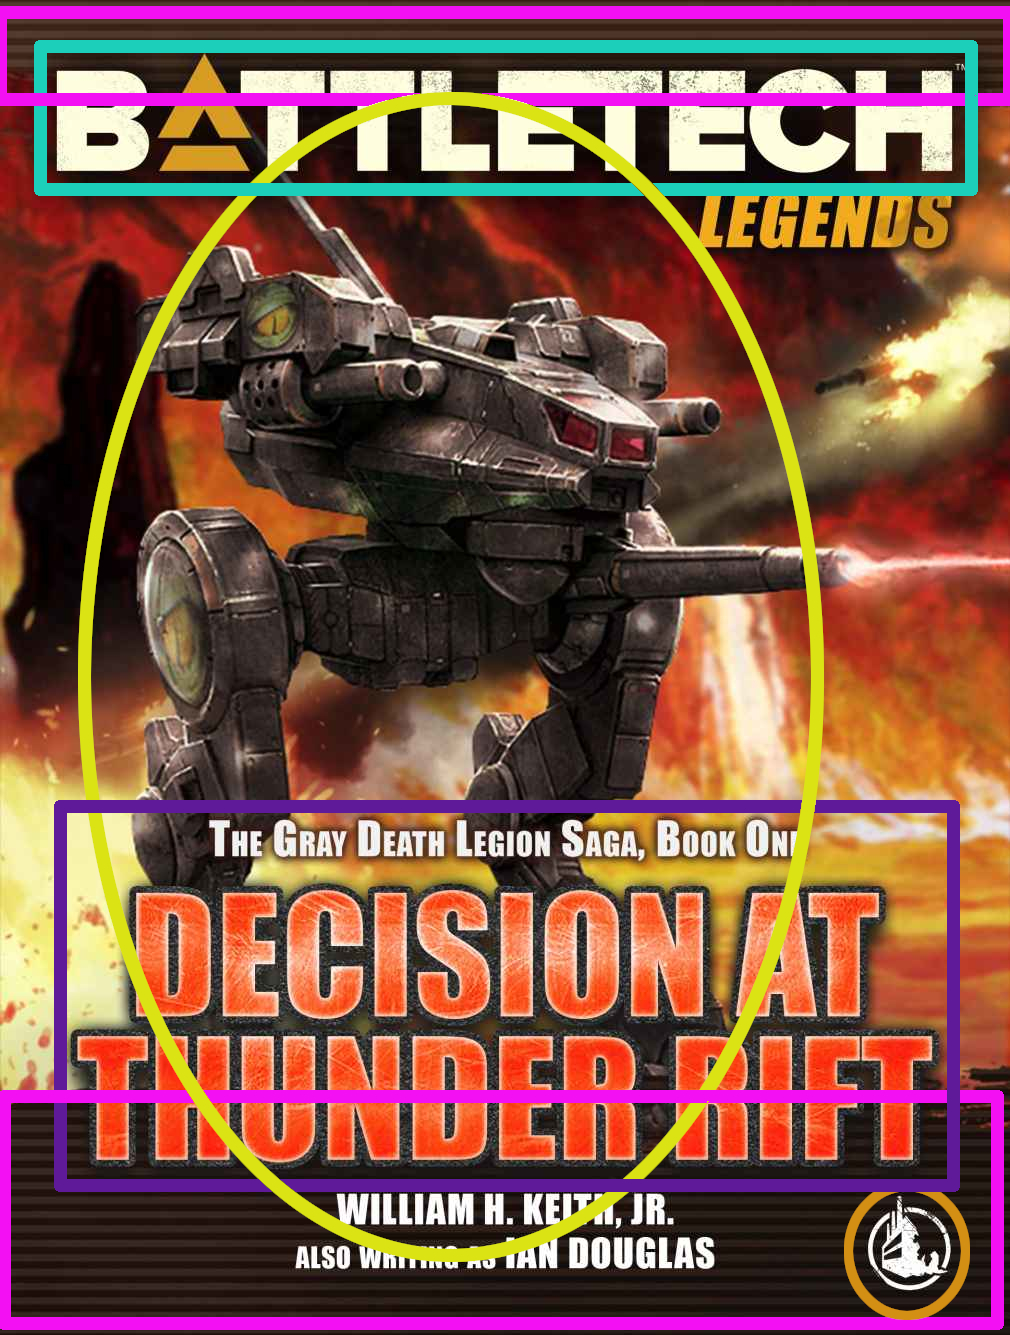 Coververgleich: Decisions at Thunder Rift/Entscheidung am Thunder Rift (Gray Death Legion Saga)